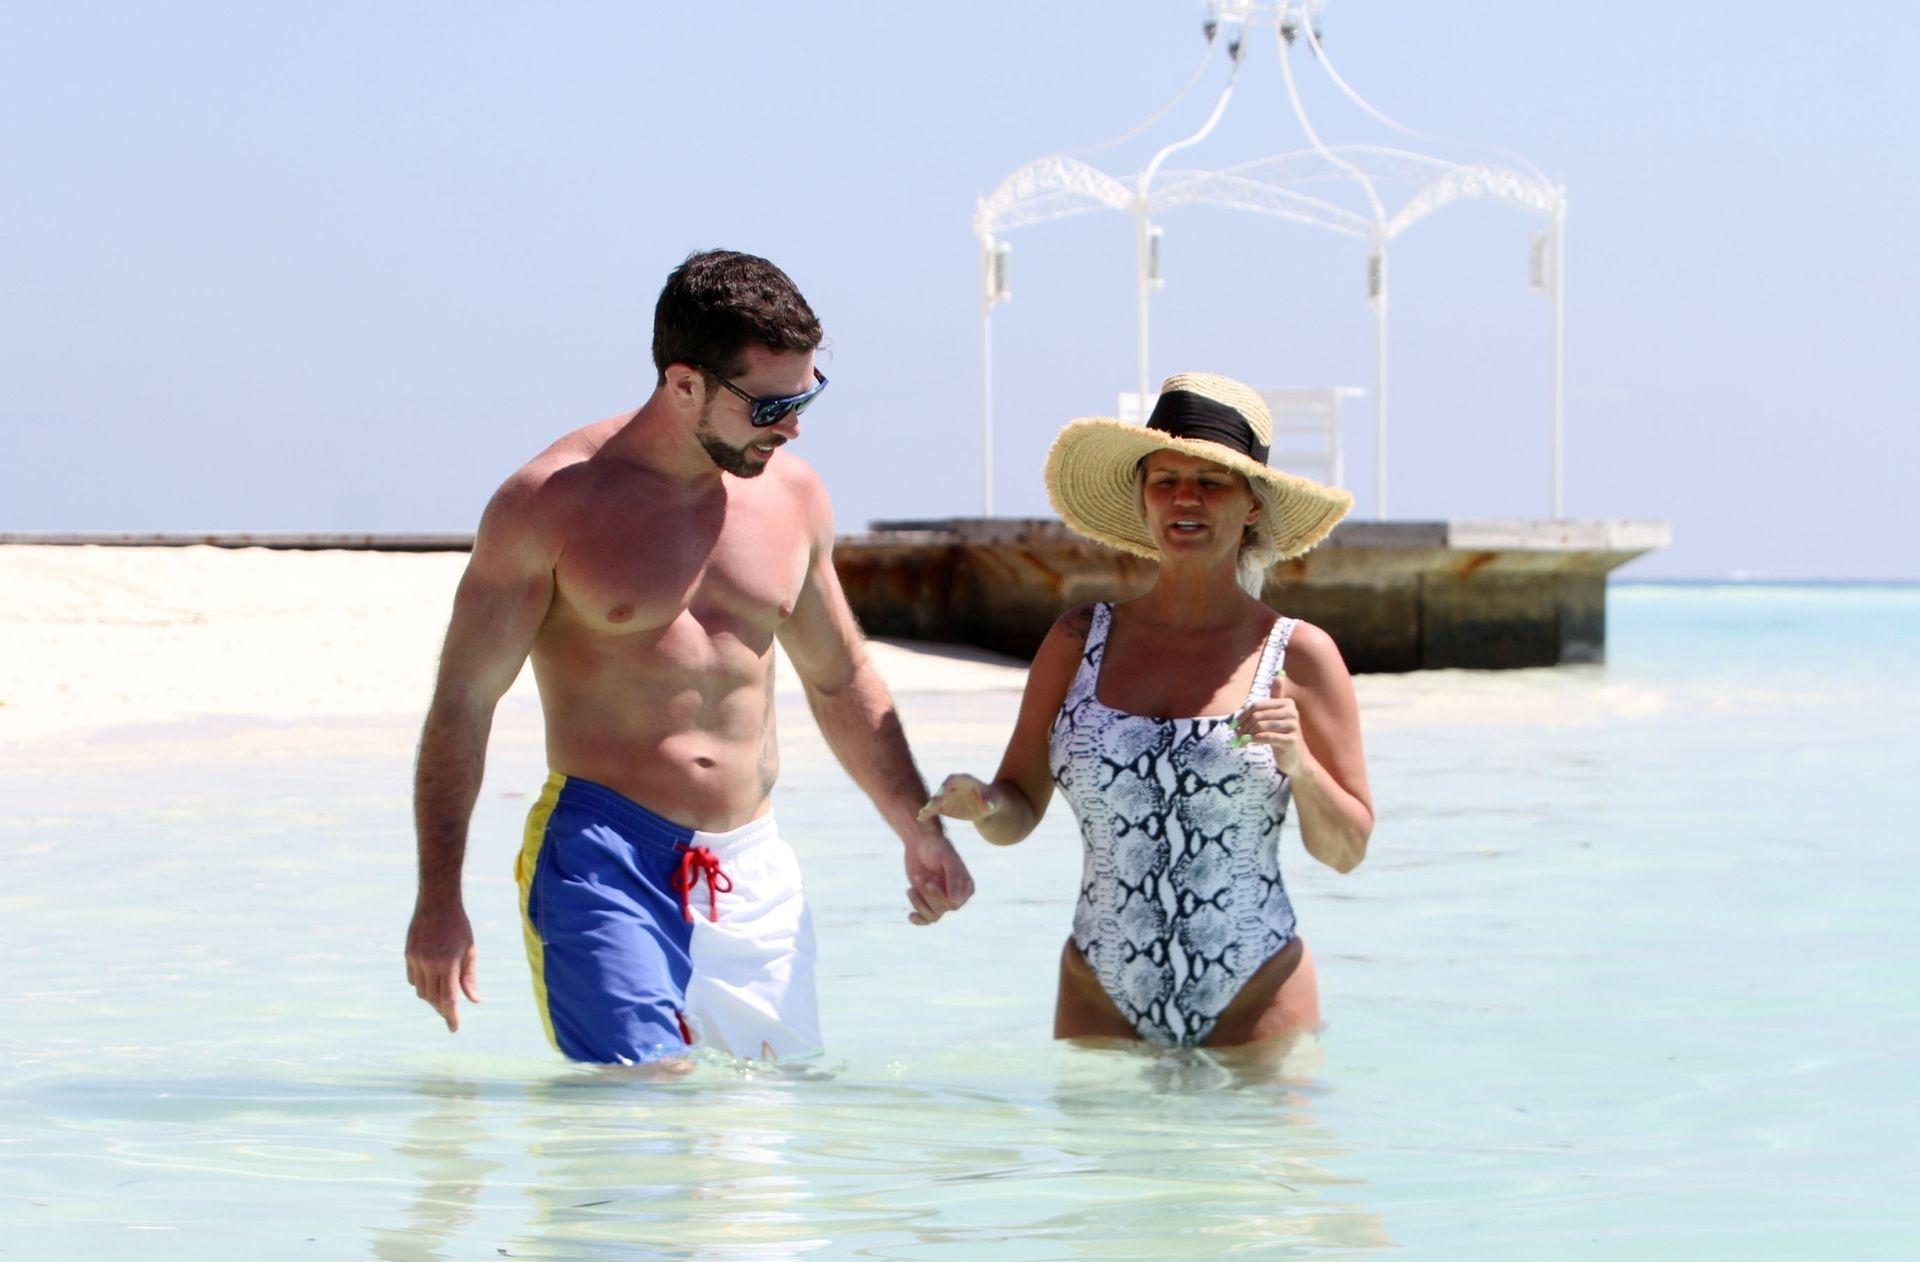 Kerry Katona & Ryan Mahoney Hit The Beach On Holiday At Their Luxury 5 Star Resort Ayada Maldives 0018